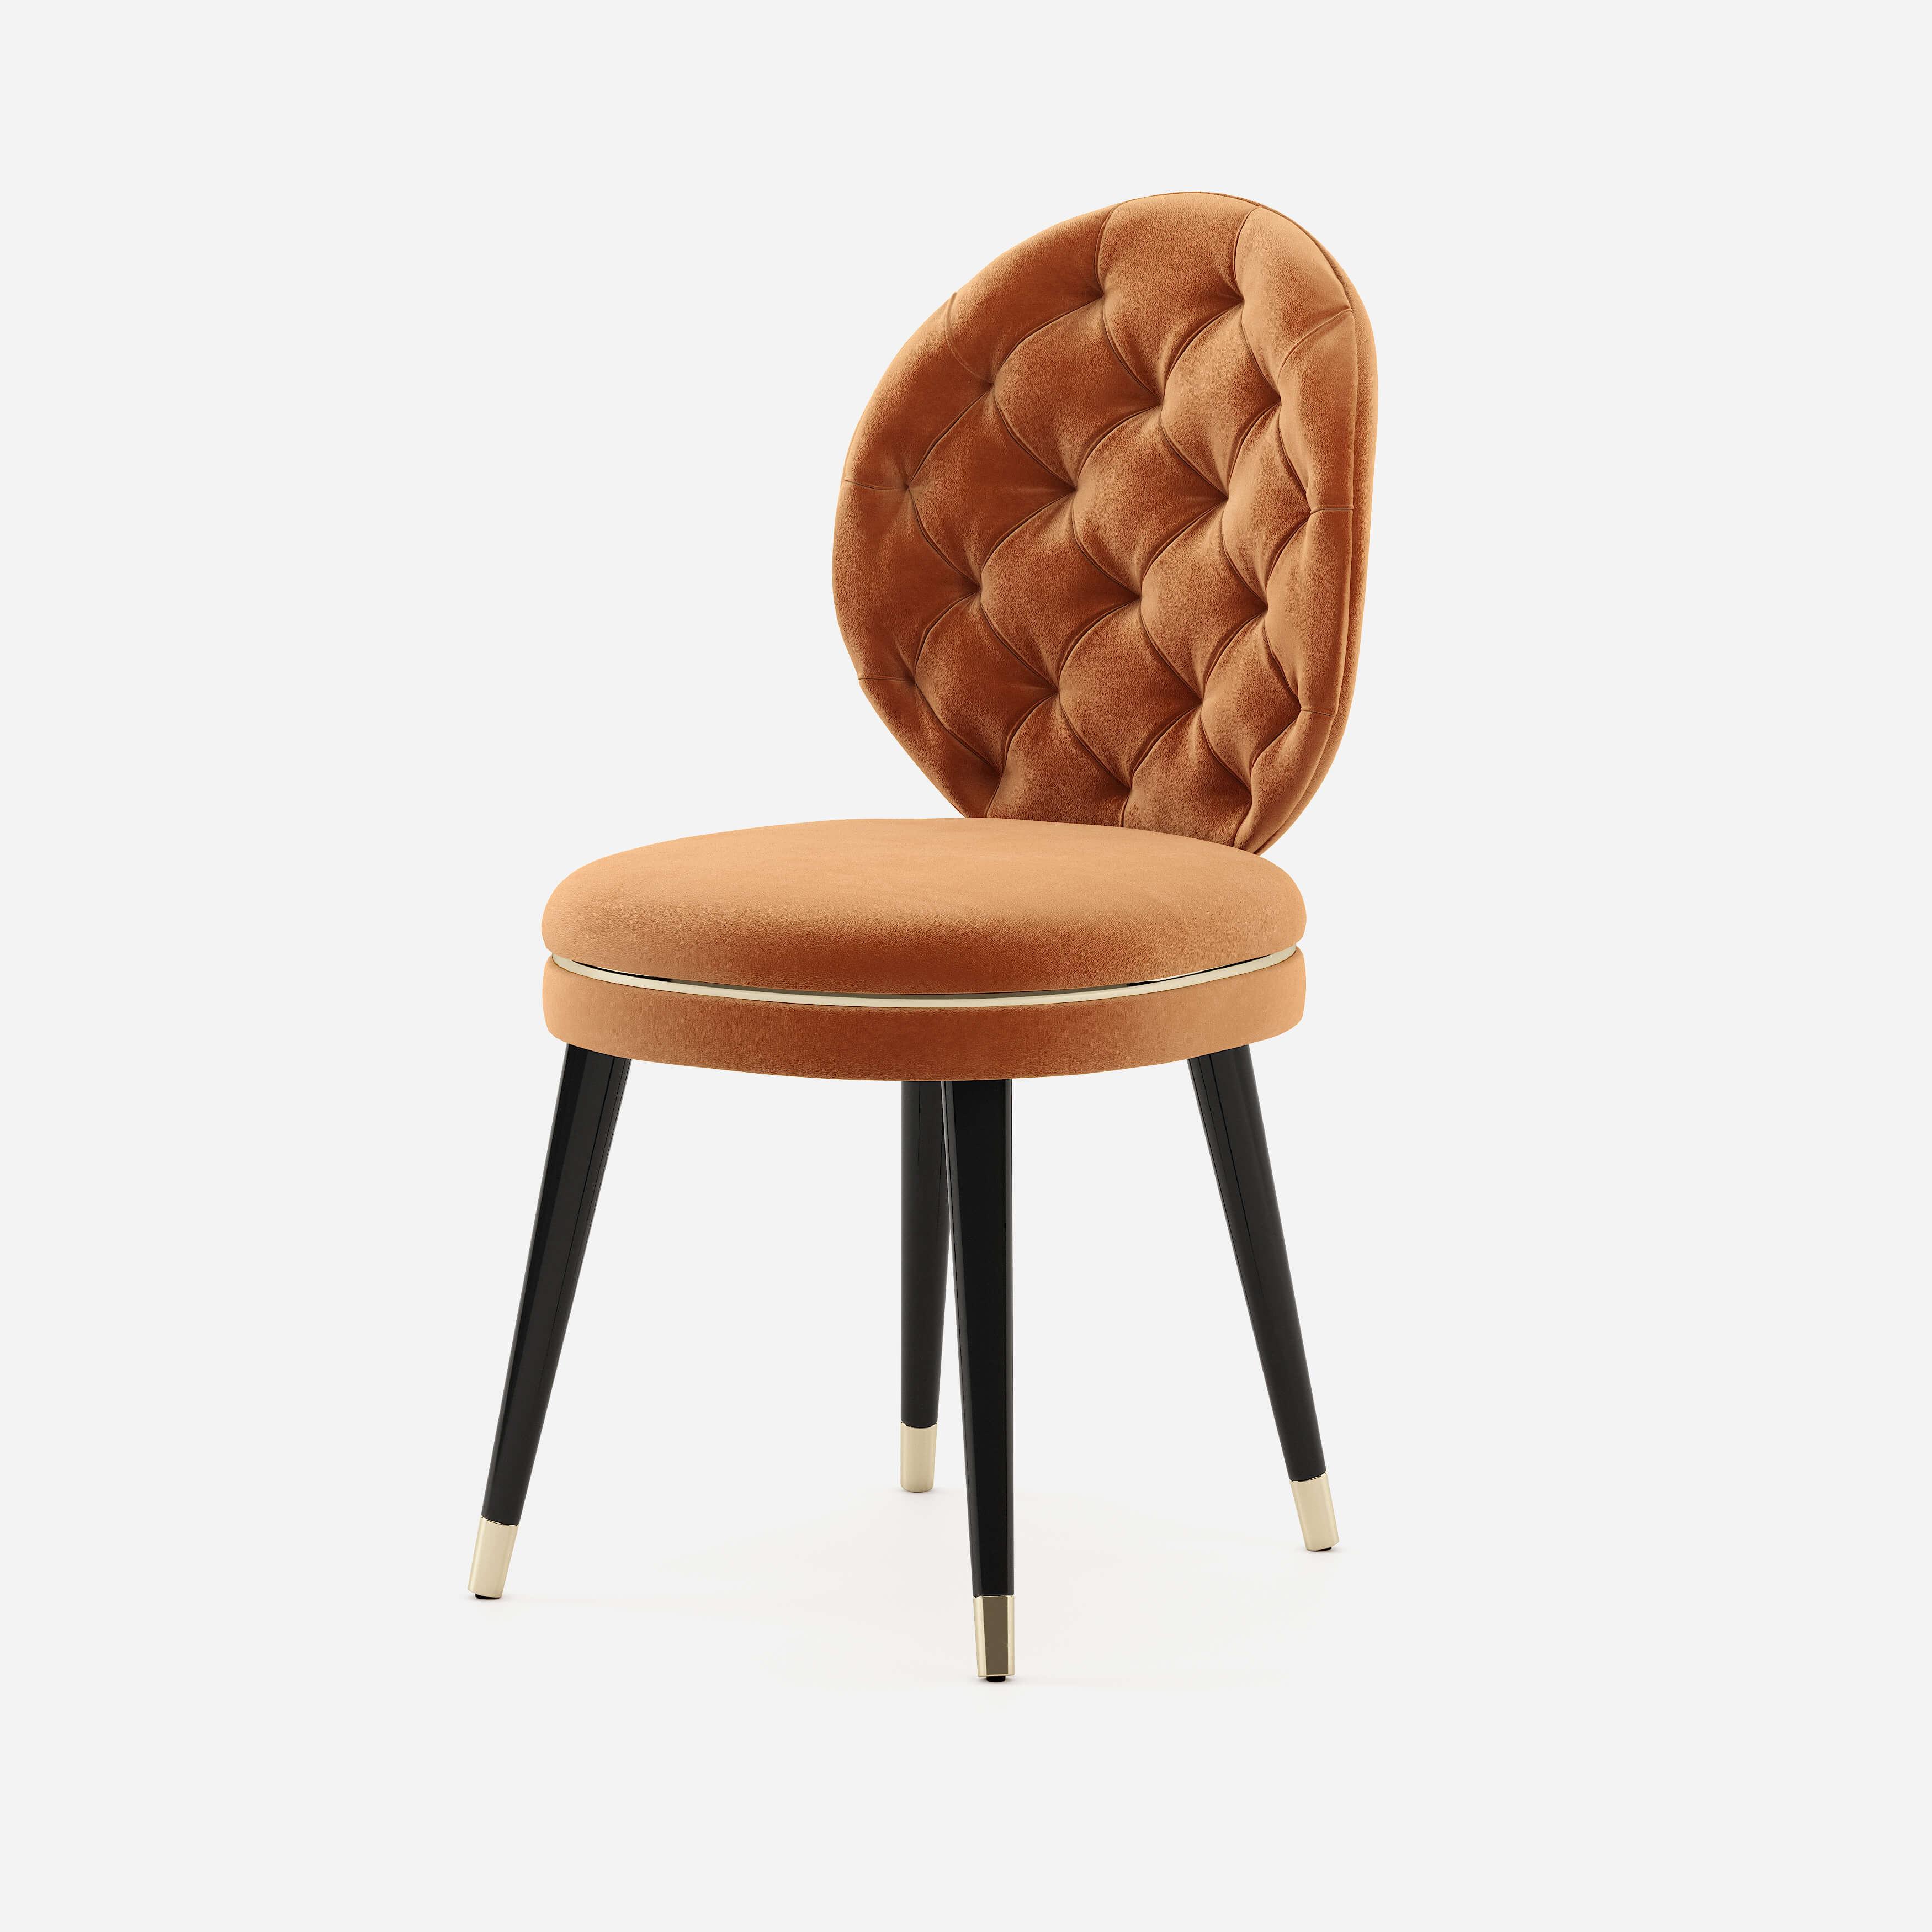 katy-cadeira-chair-velvet-estofo-interior-design-home-decor-gold-details-brass-metals-wood-domkapa-living-room-1